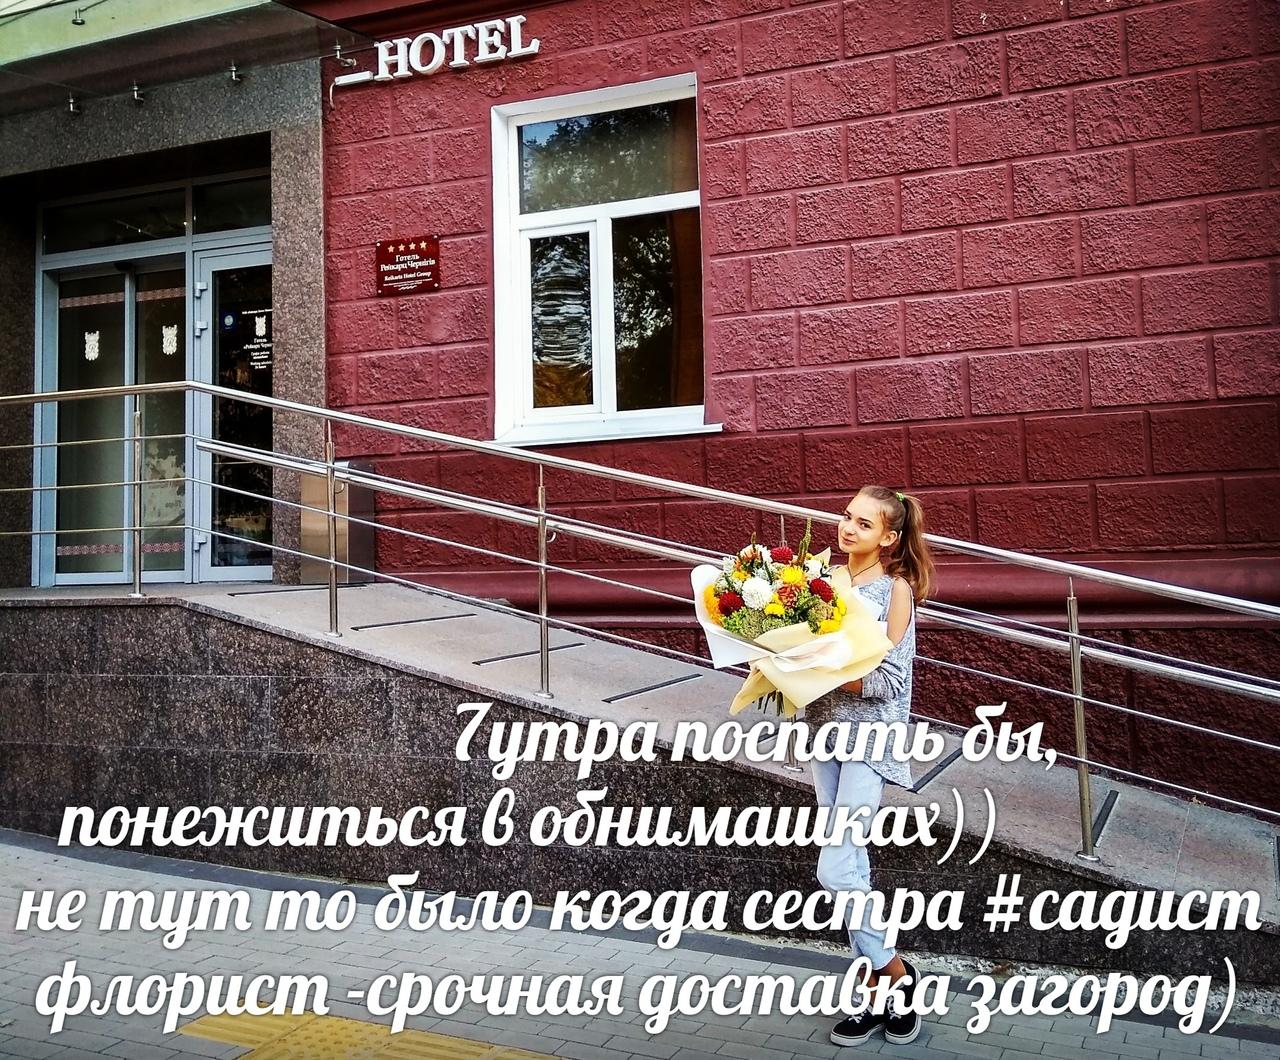 фото из альбома Машулик Бондаренко №1